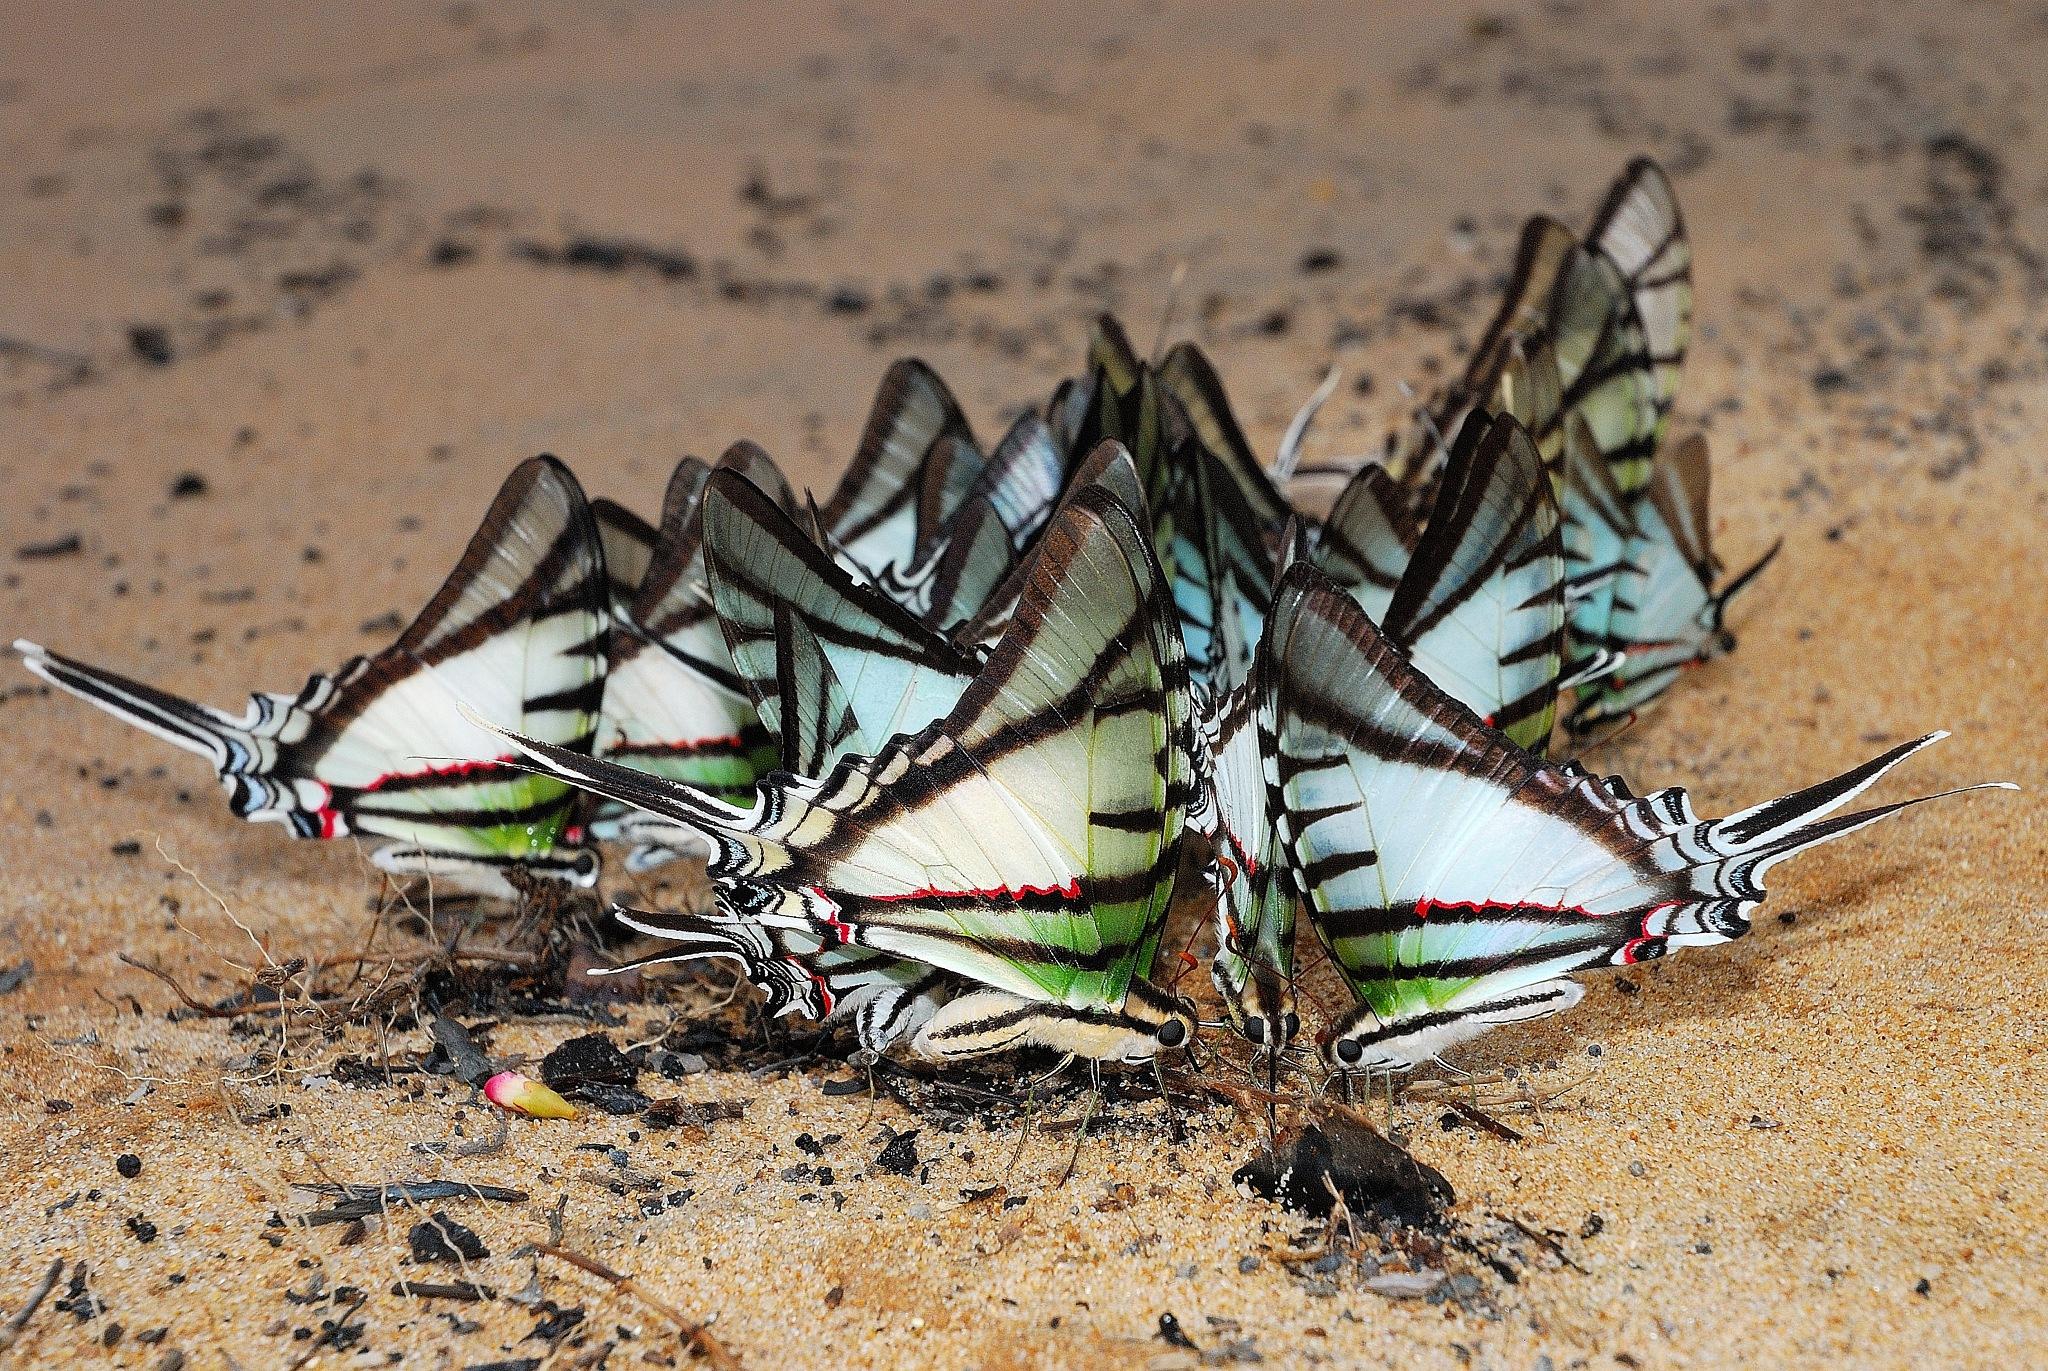 Butterfly flock by Gustavo de Mattos